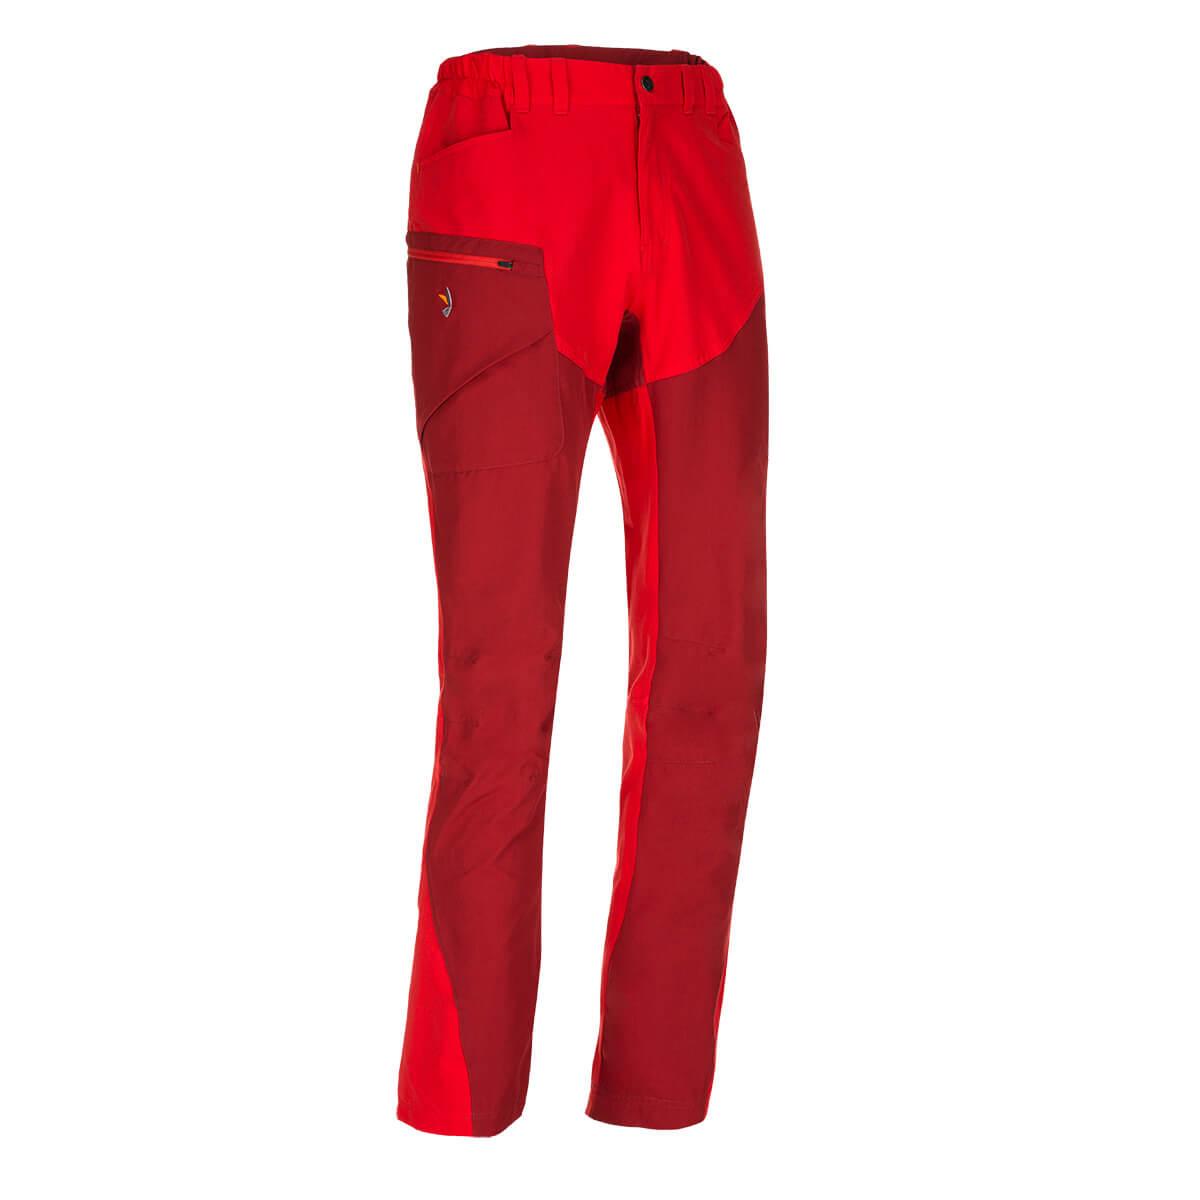 Nohavice Zajo Magnet Neo Pants Lava - veľkosť M